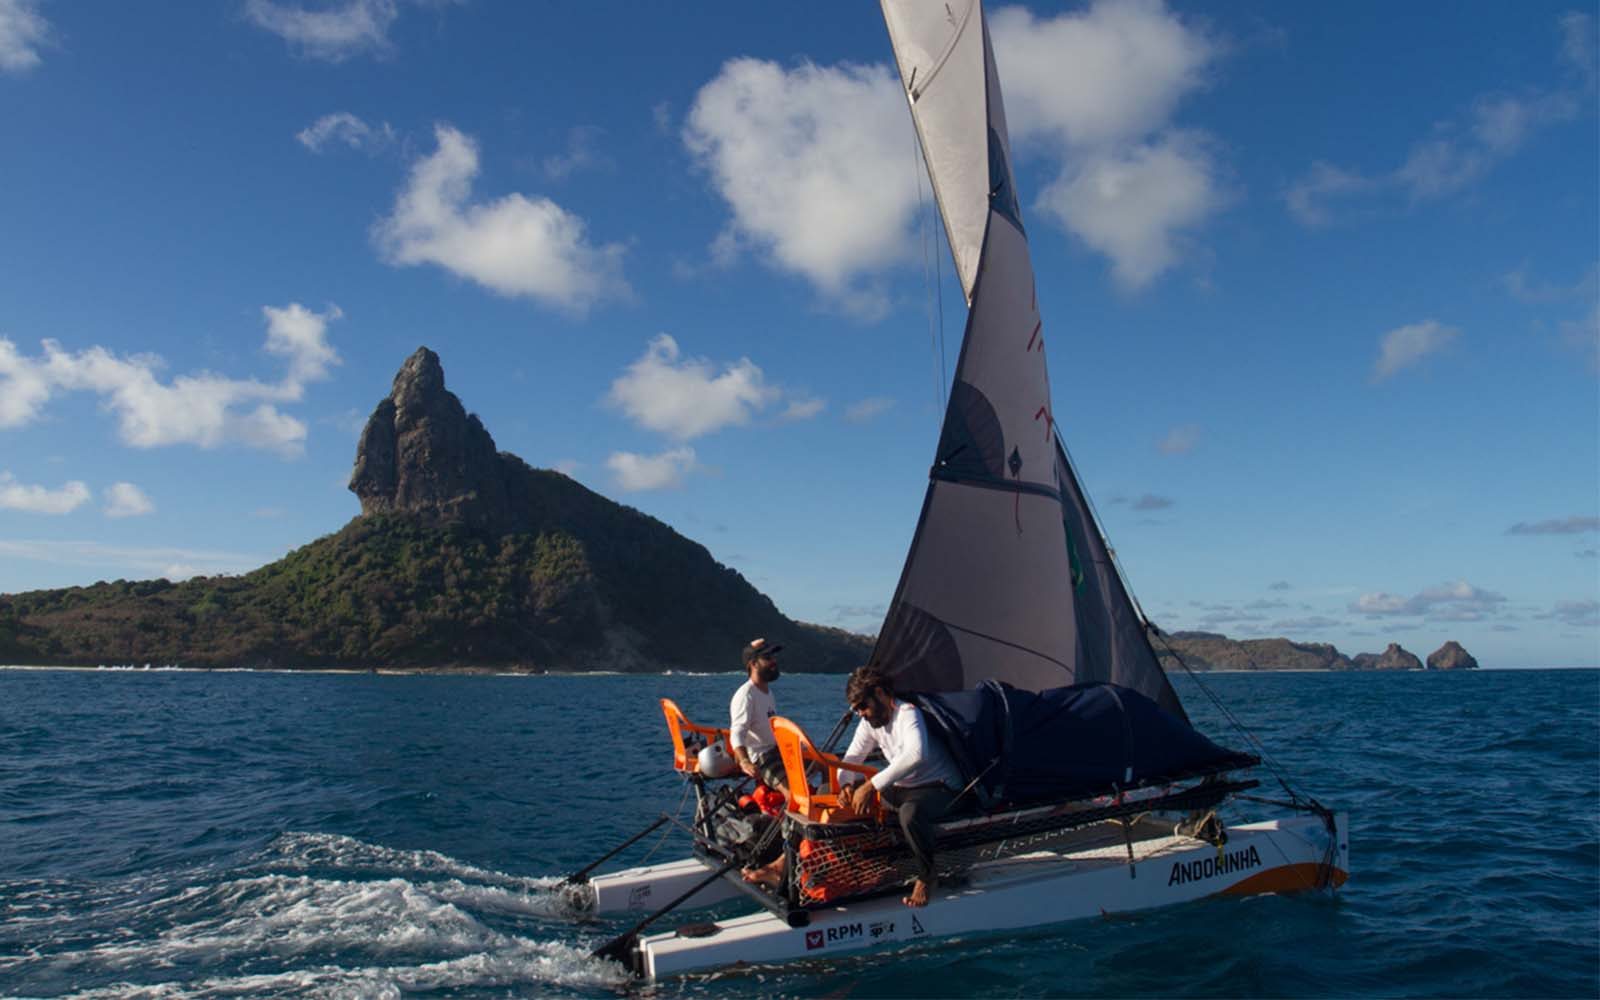 velejadores projeto noronha - boat shopping